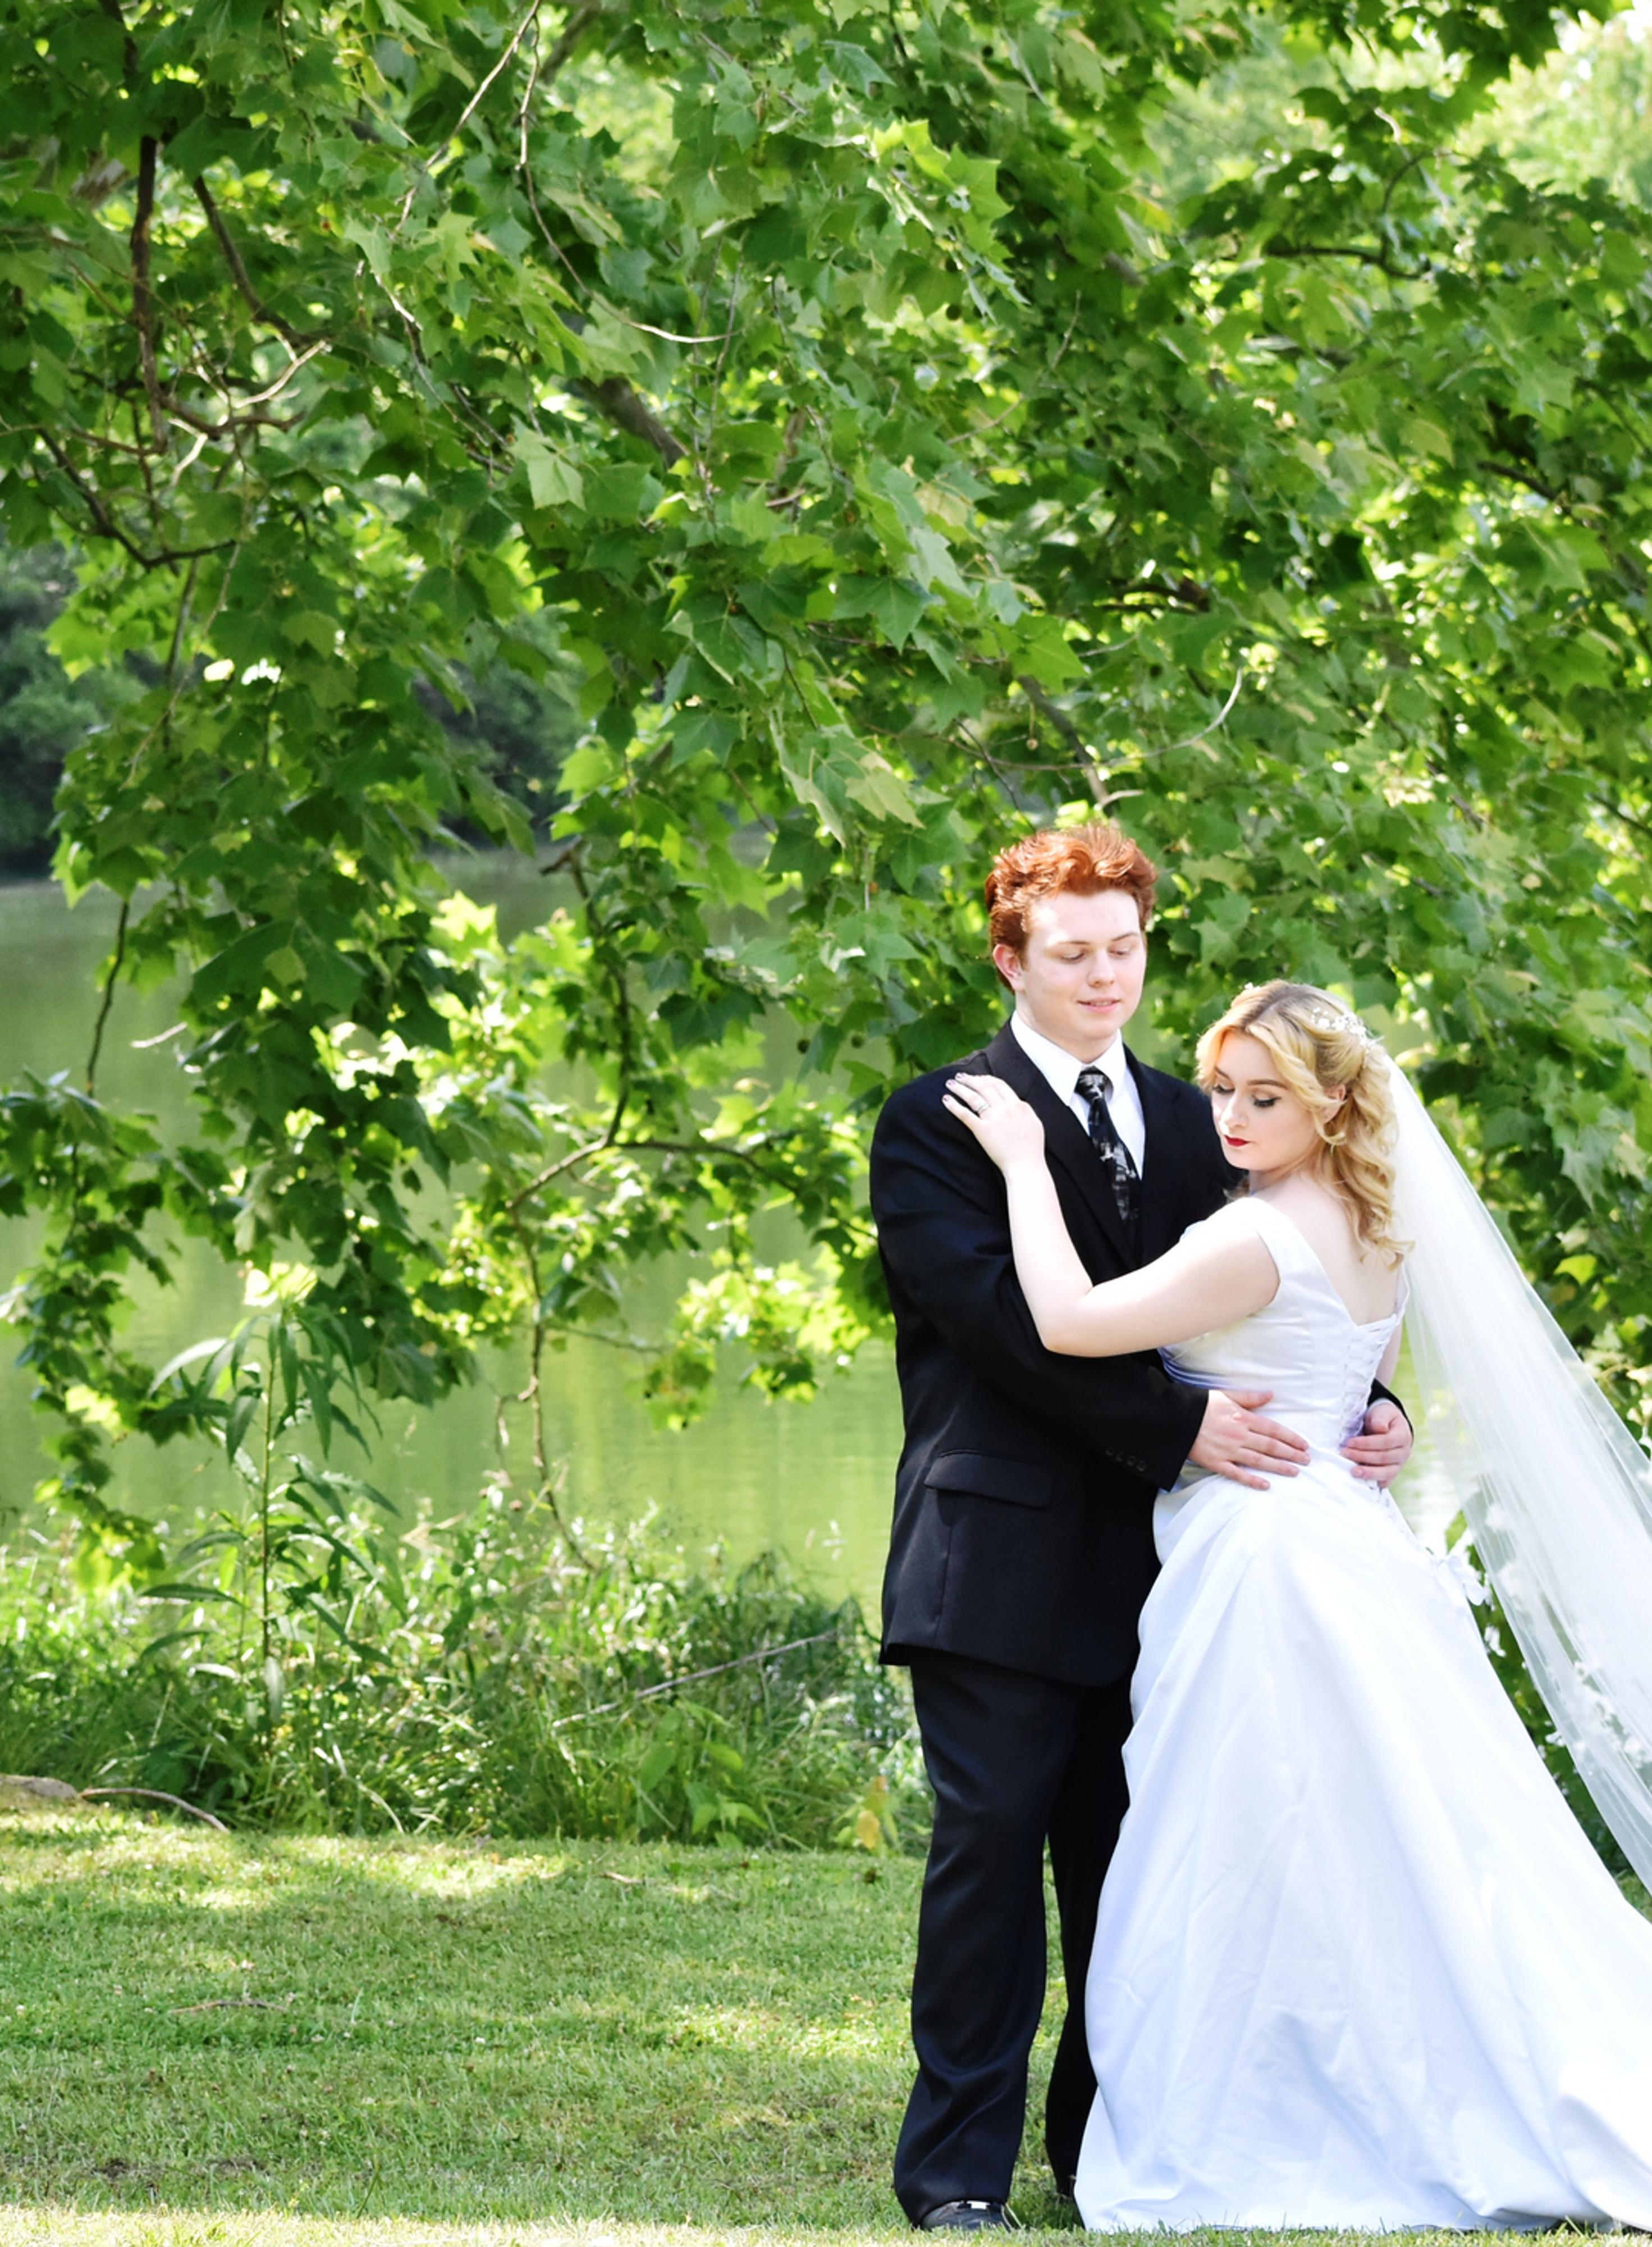 Wedding/Event Property Tour